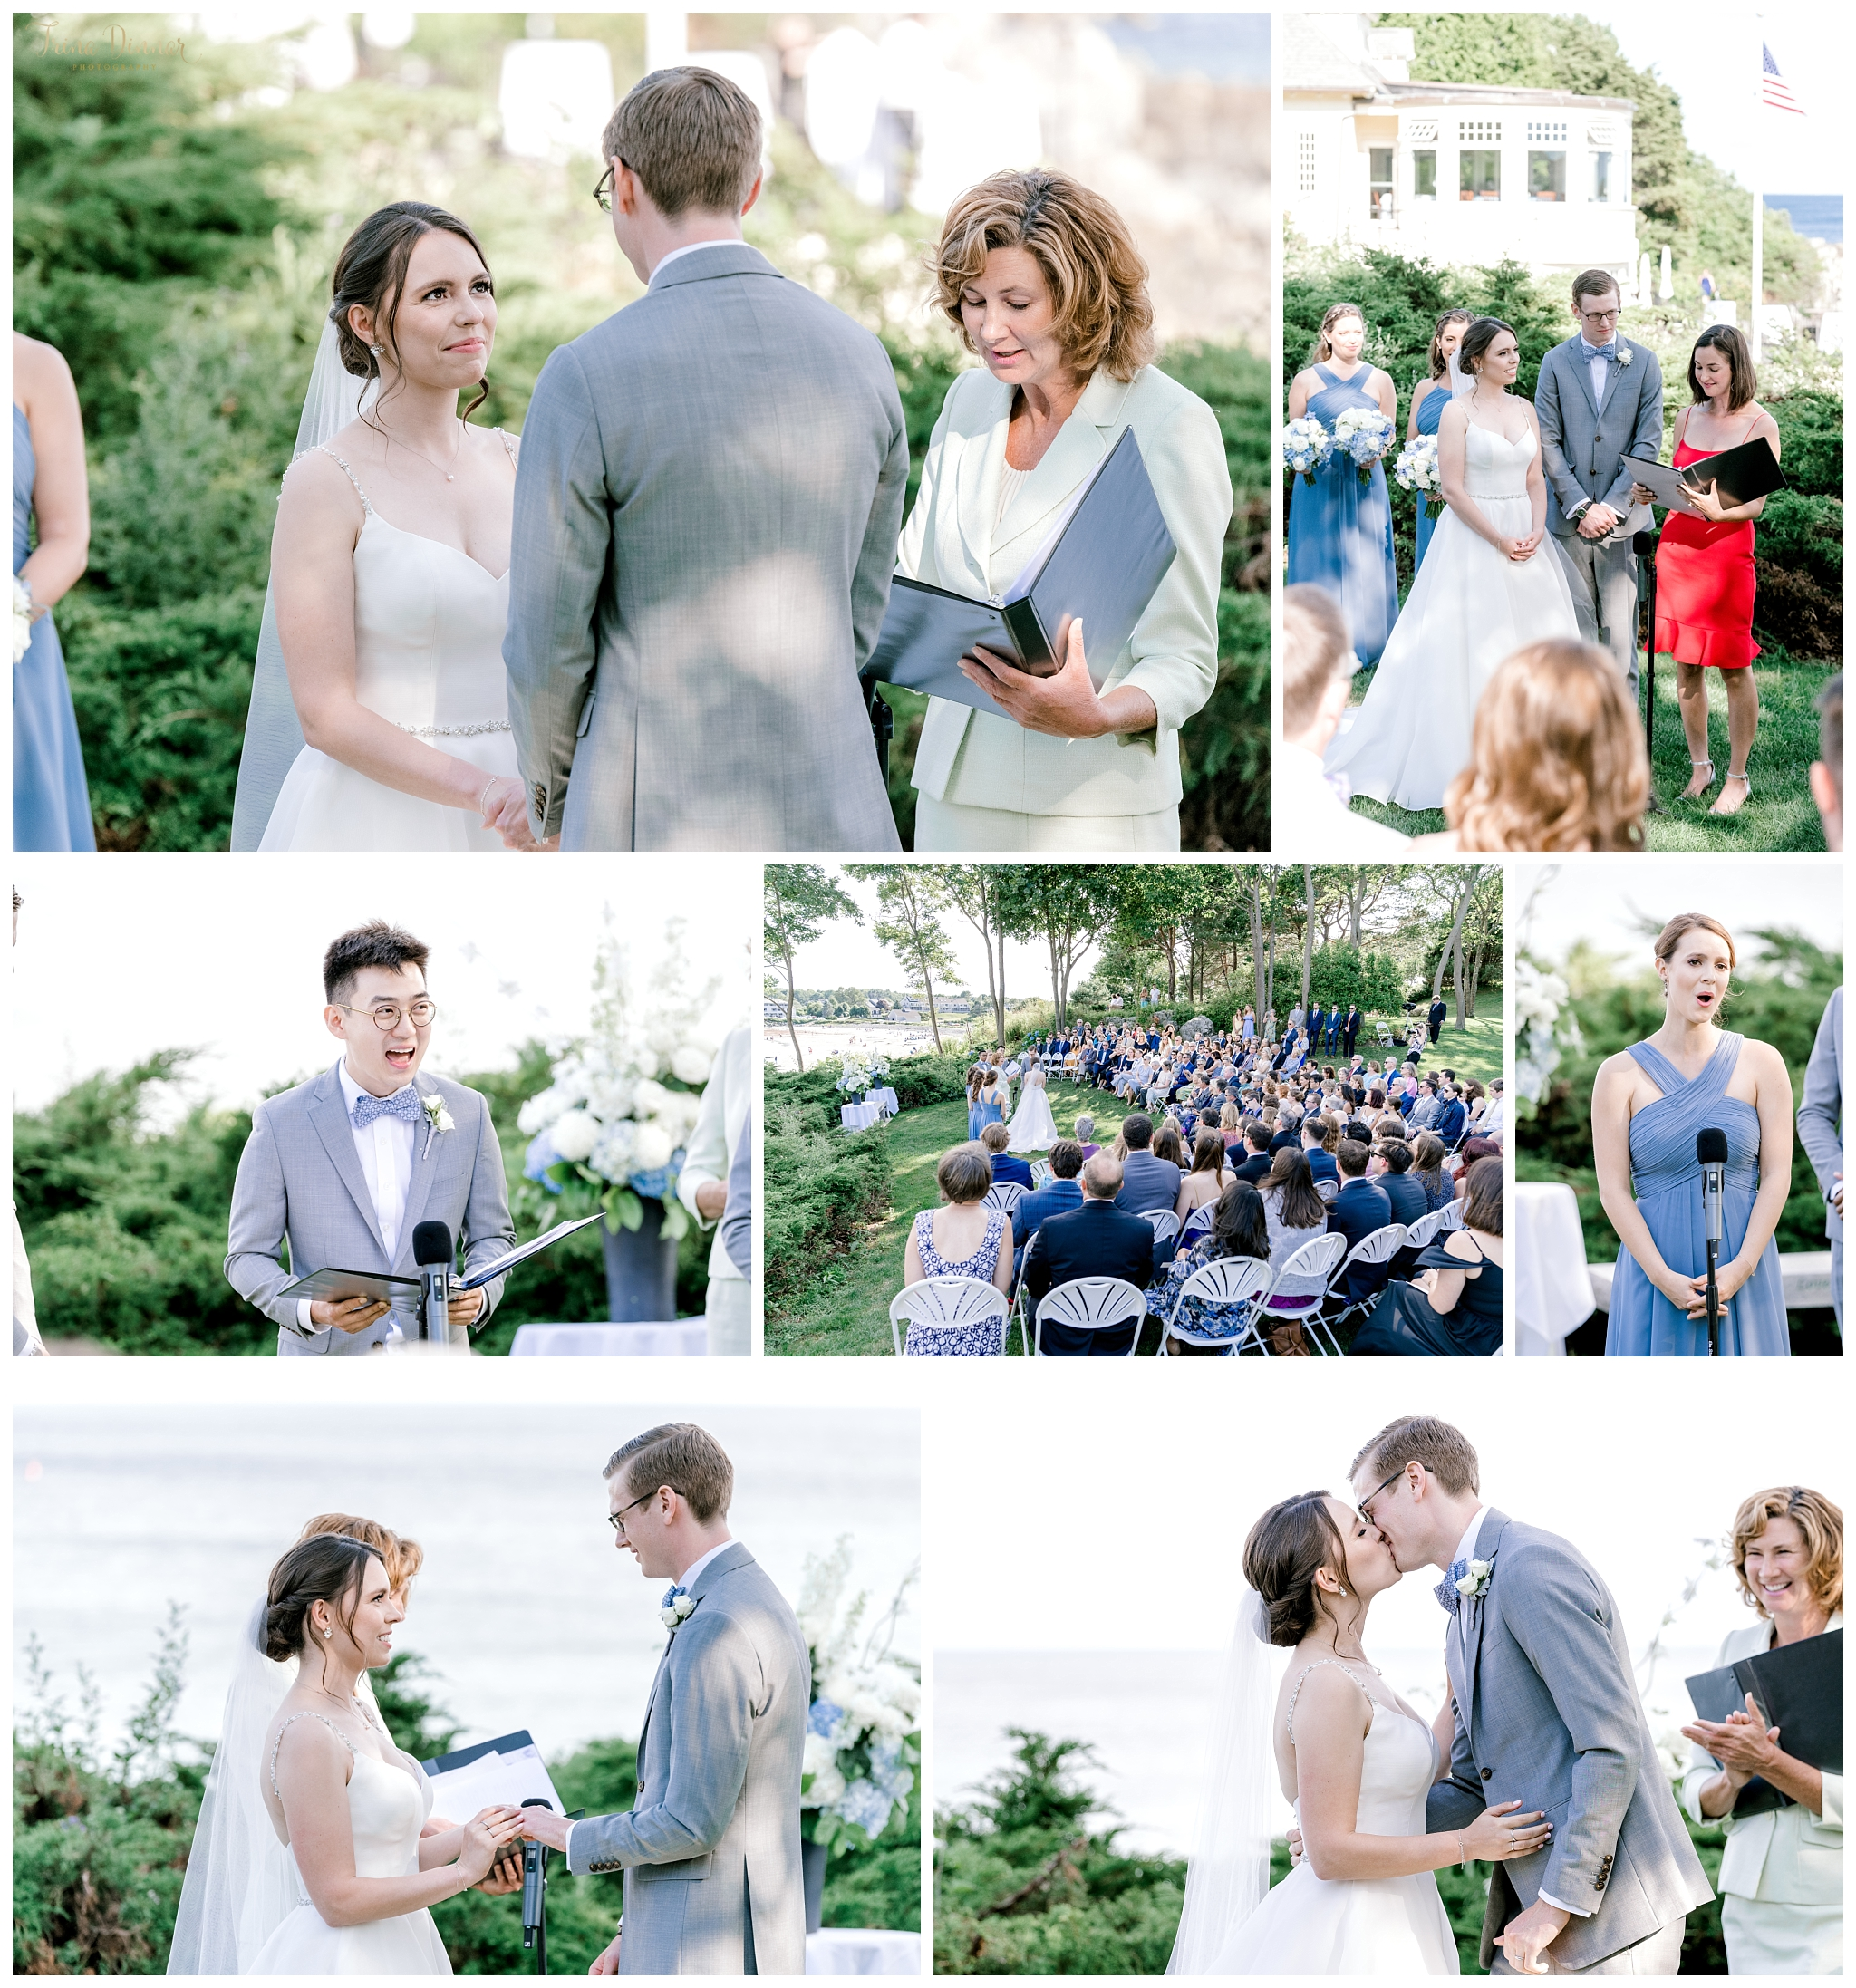 York Maine Wedding Ceremony at Hartley Mason Reserve Park